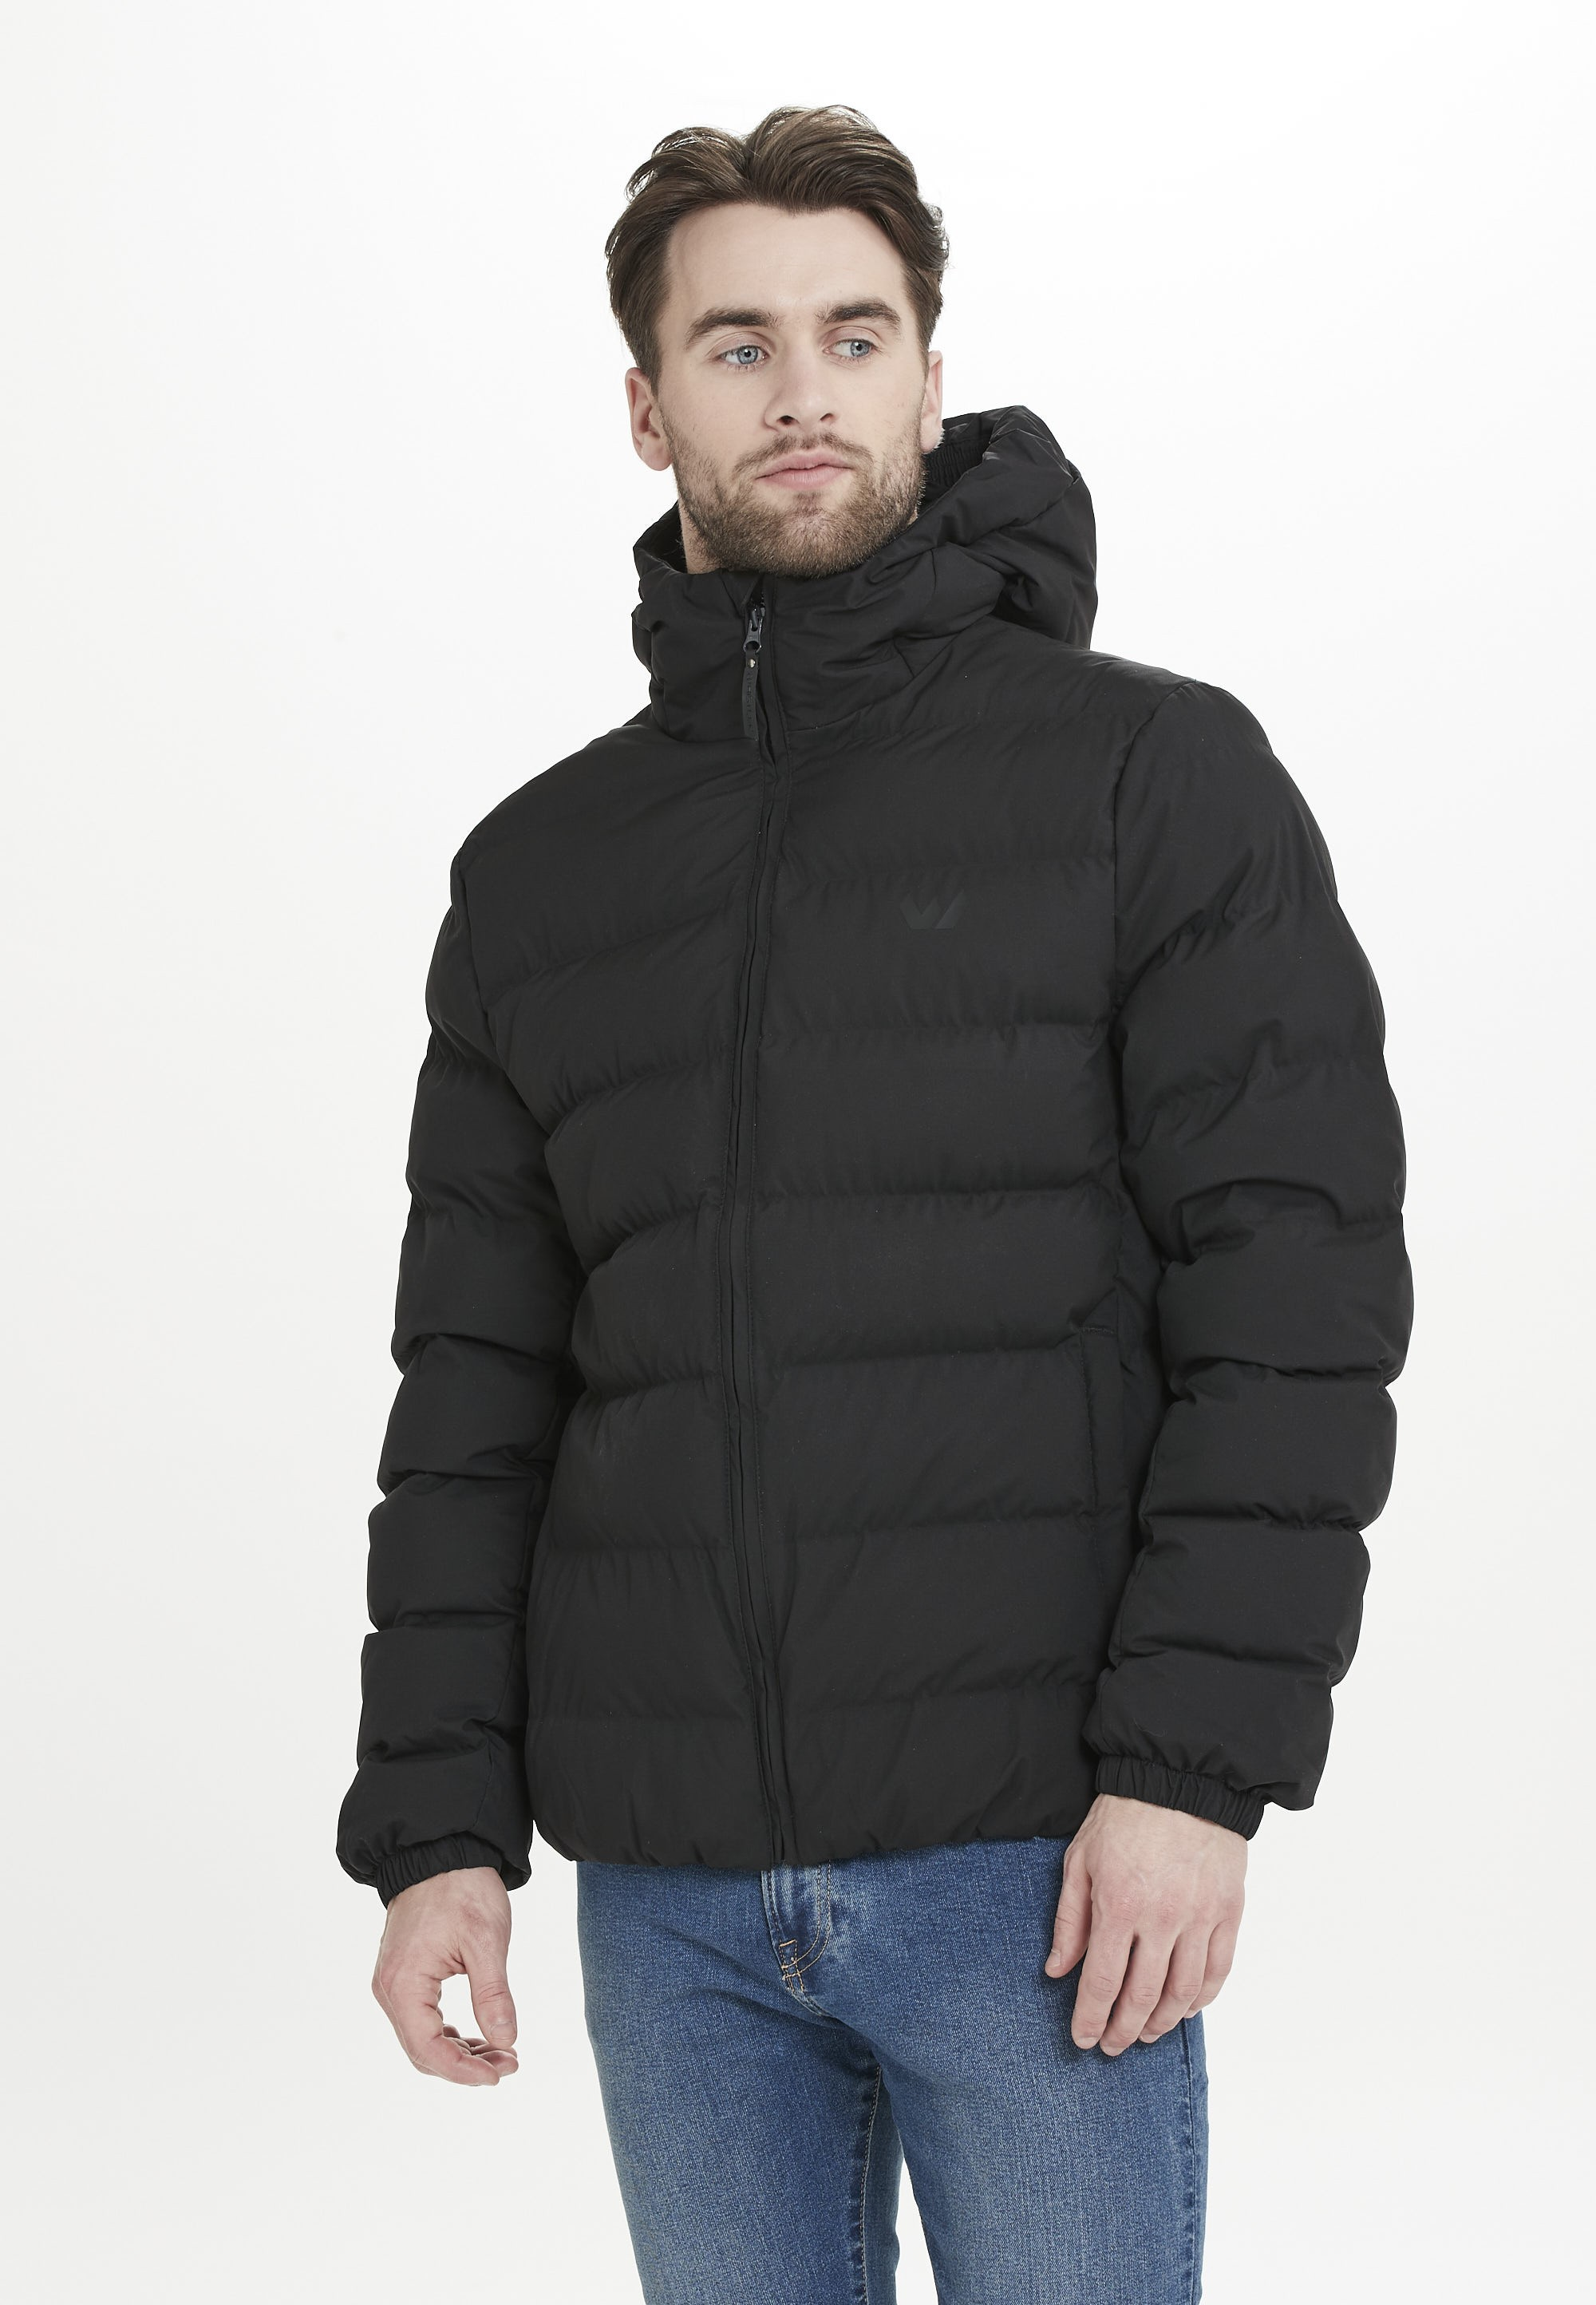 Kurtka zimowa mêska Whistler Jakob M Padded Jacket